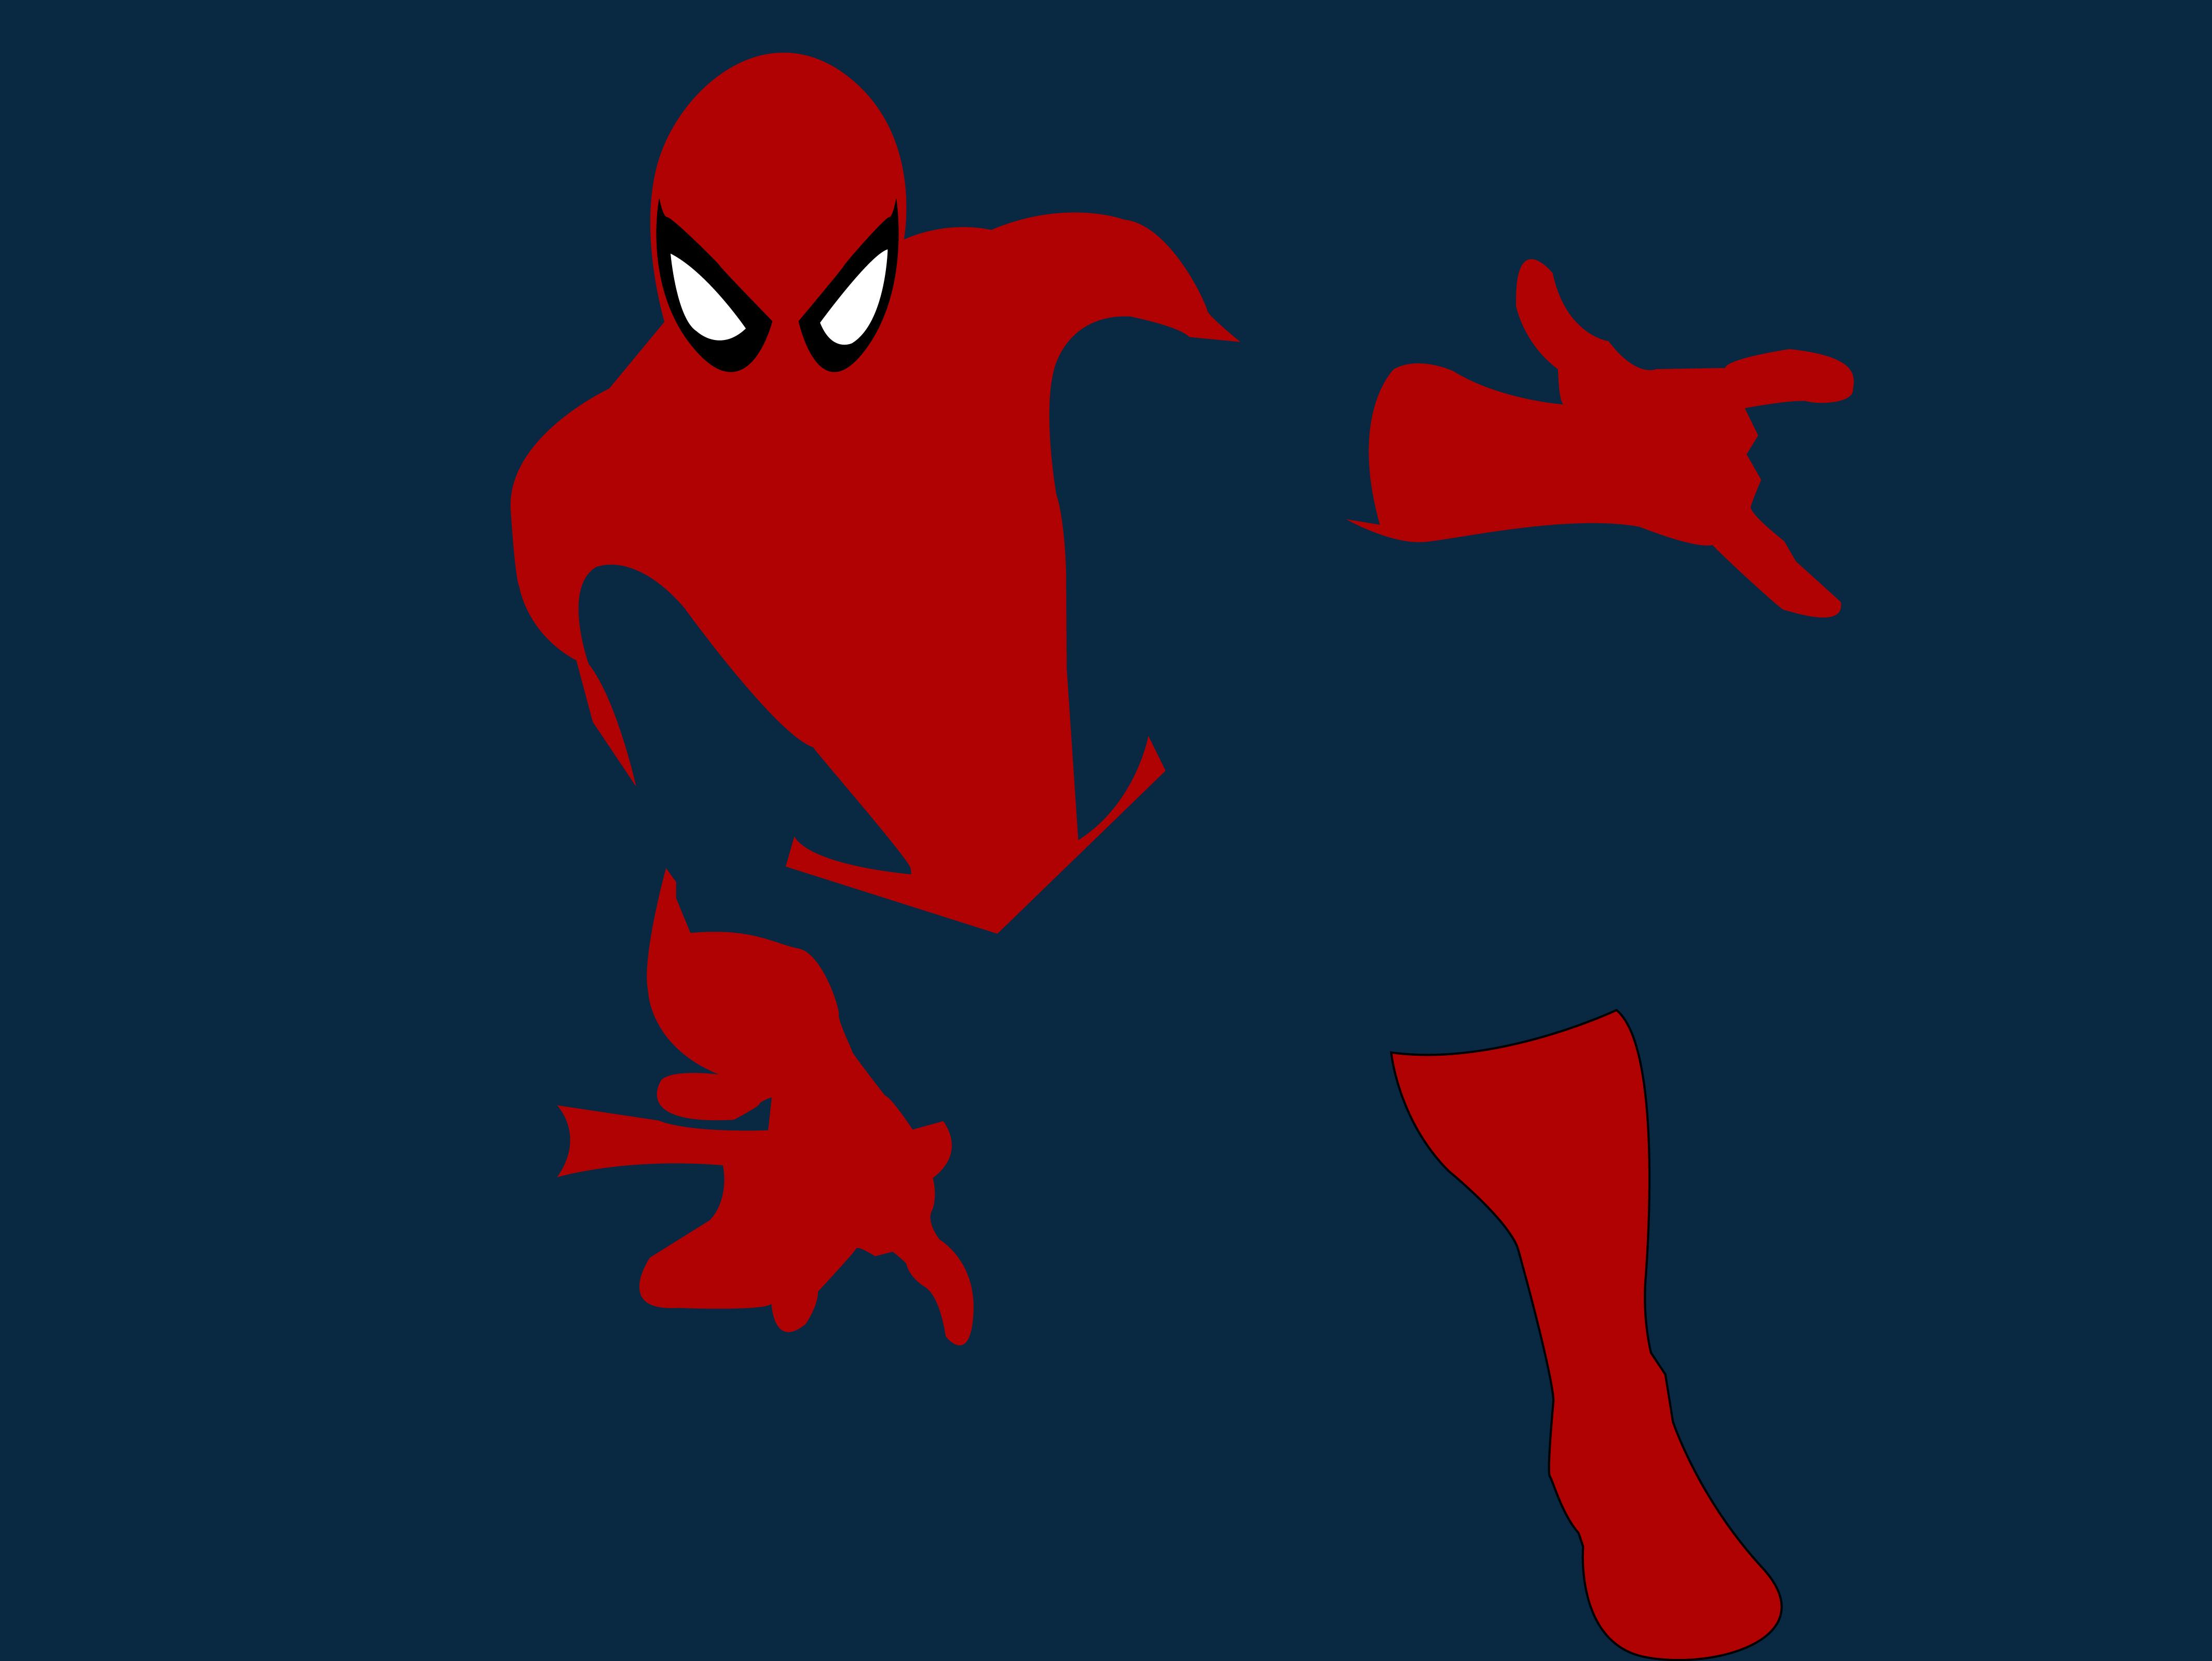 1080x1920 Daredevil Minimalism Iphone 7 6s 6 Plus Pixel: 1080x1920 Spiderman Minimal Iphone 7,6s,6 Plus, Pixel Xl